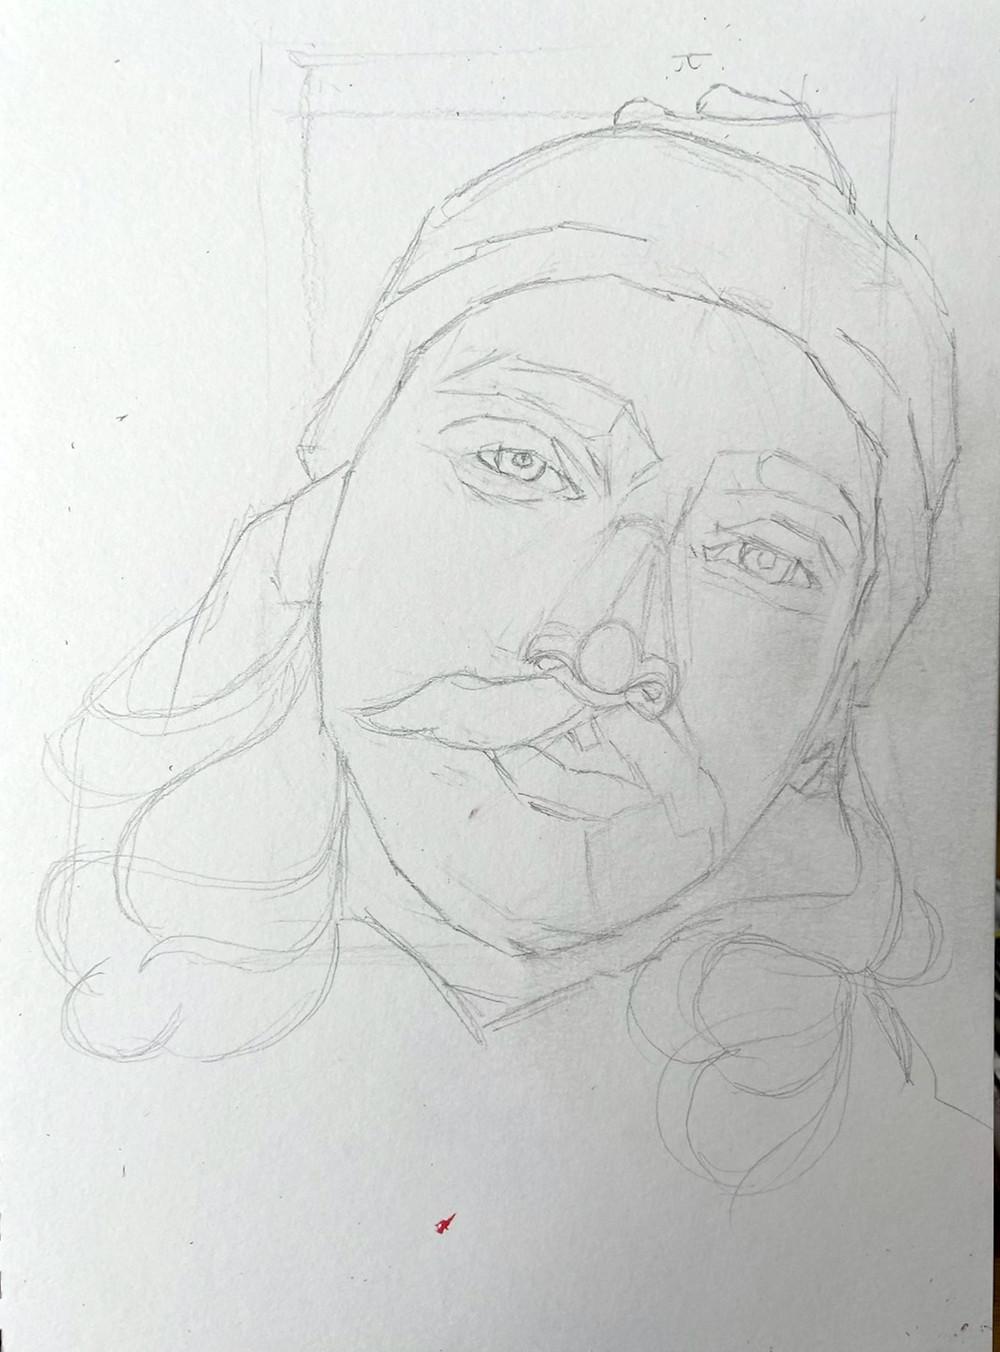 9x12 graphite on paper